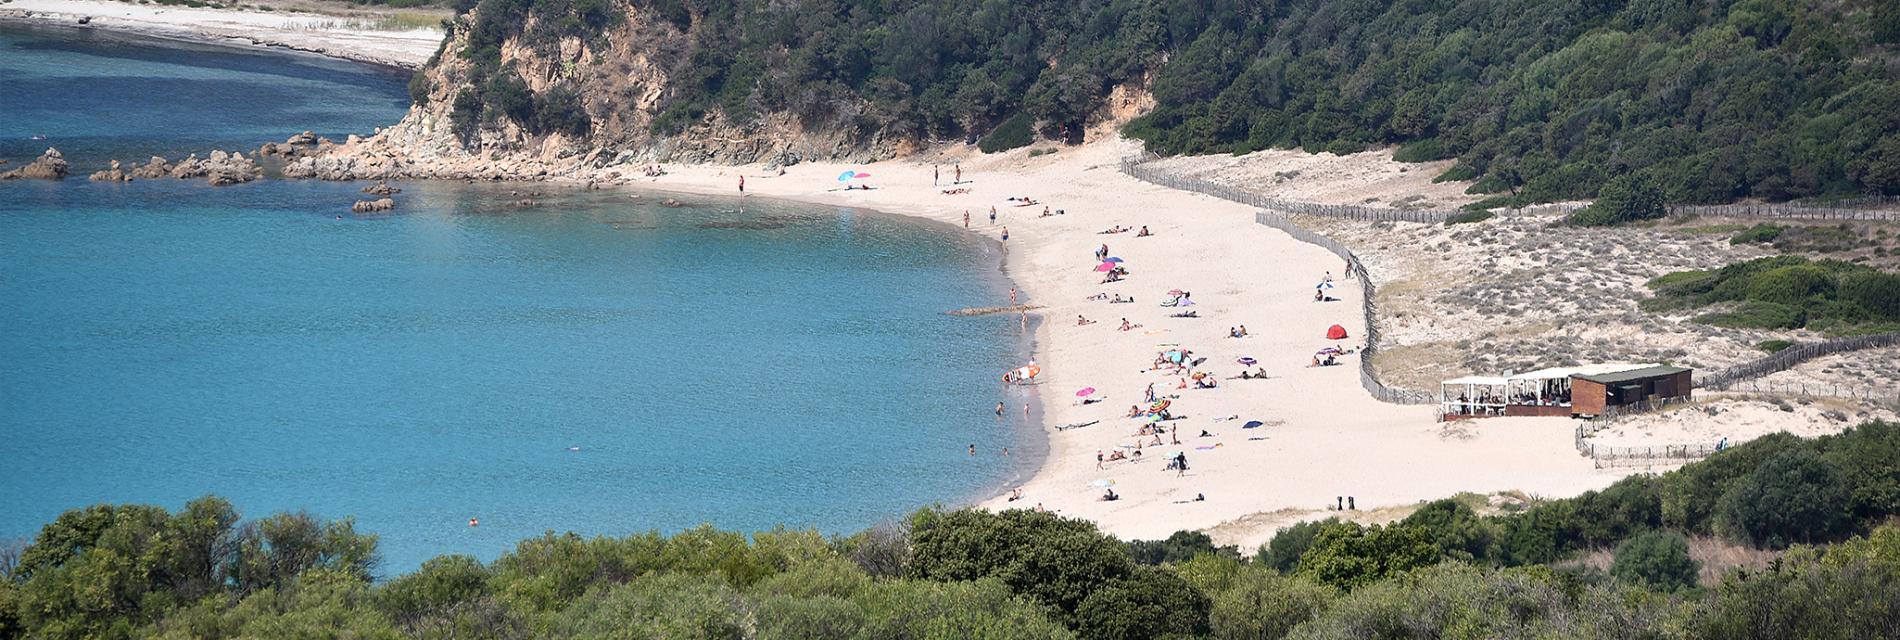 Slide la plage de Cupabia